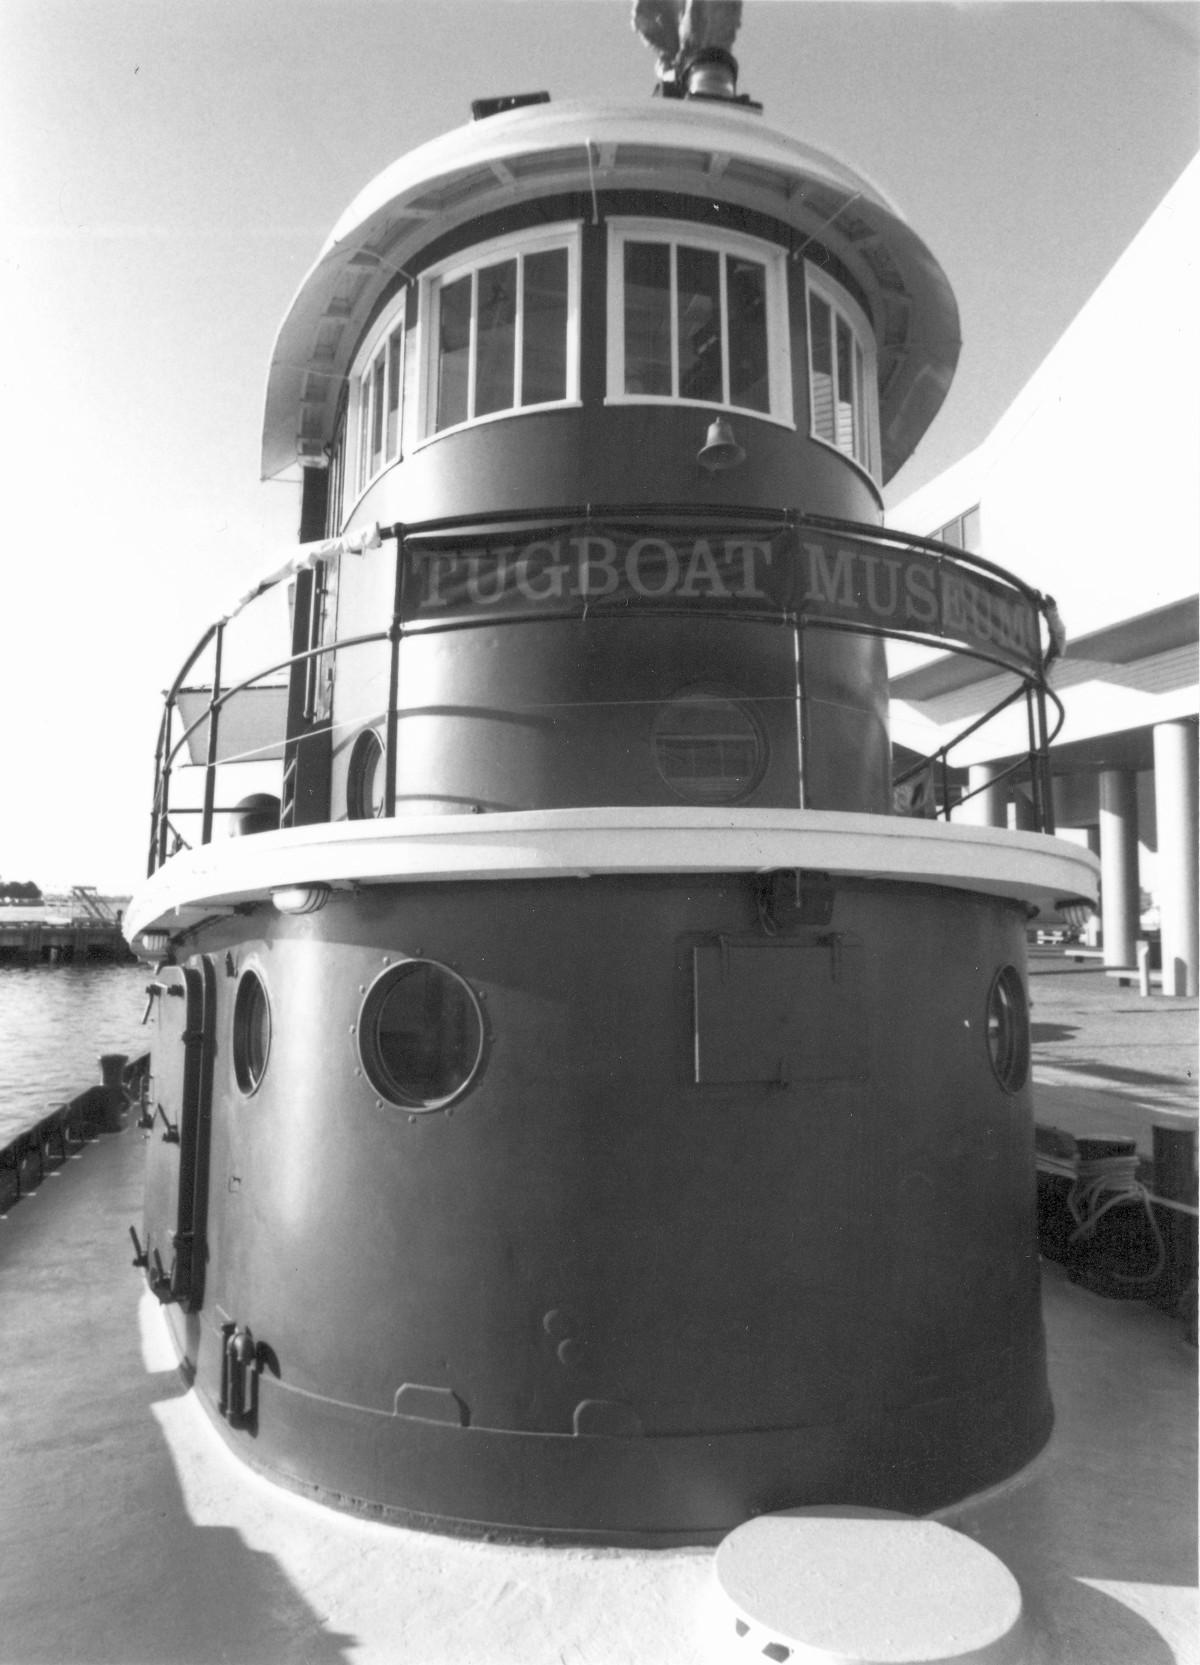 Huntington Tugboat